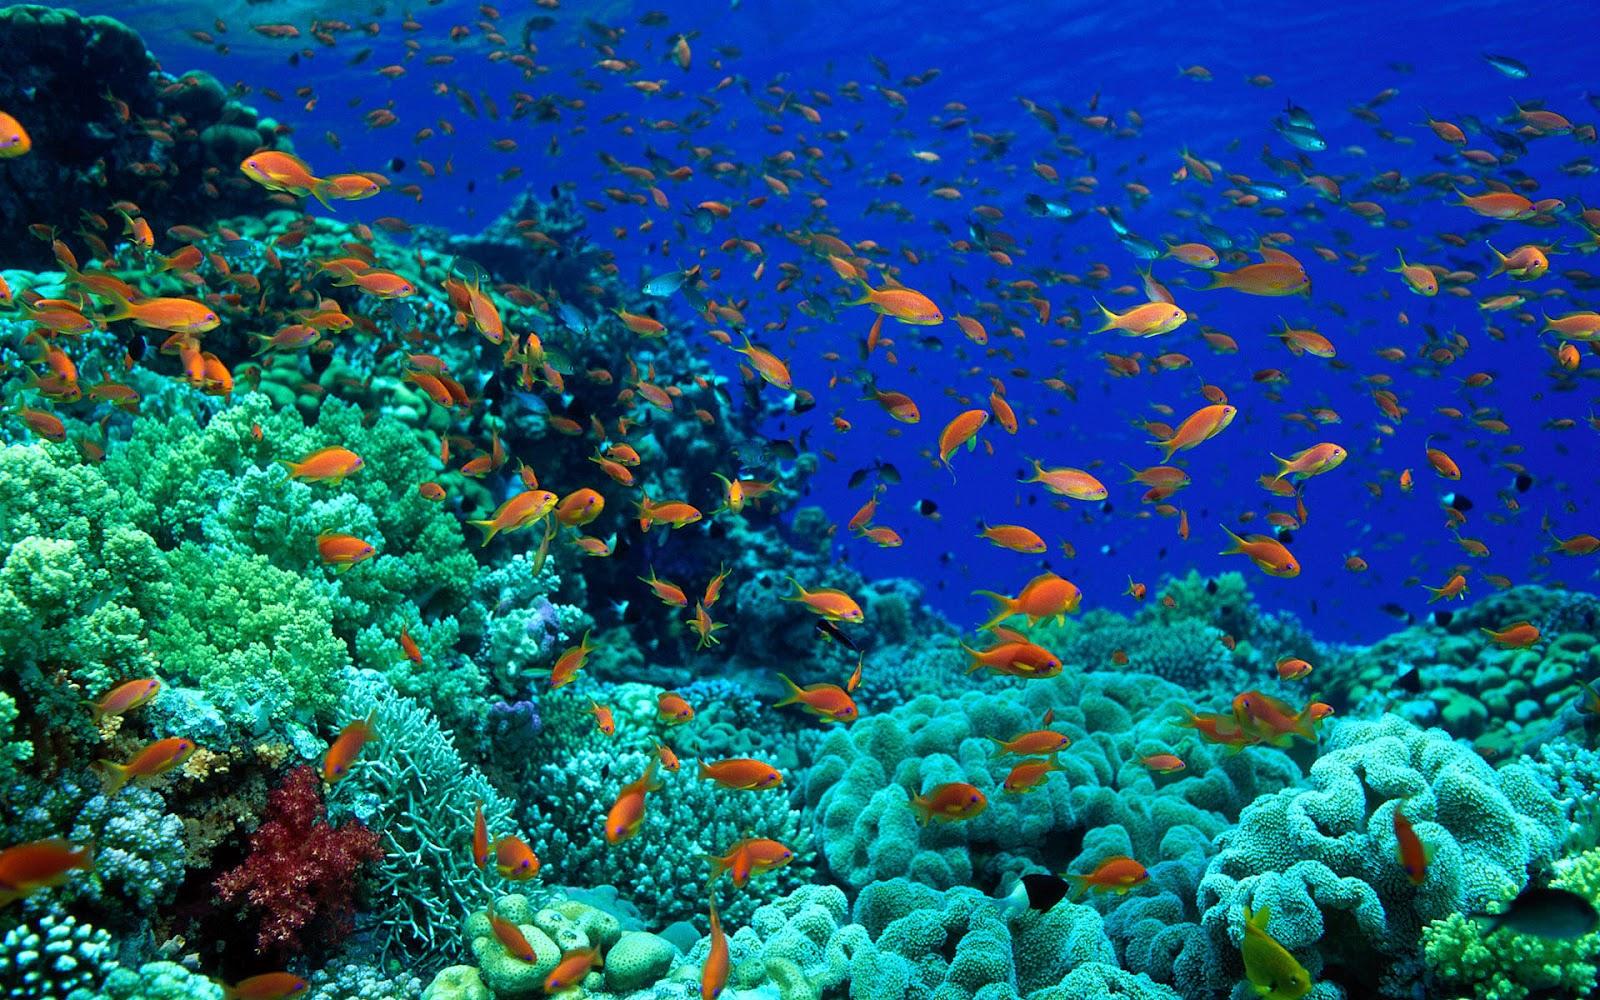 http://4.bp.blogspot.com/-k6csTW1T-tQ/UAHEjg0slDI/AAAAAAAAimw/5Tpb-SyNPhE/s1600/Mooie-onderwater-achtergronden-hd-foto-vissen-wallpapers-oceaanbodem-dieren-13.jpg